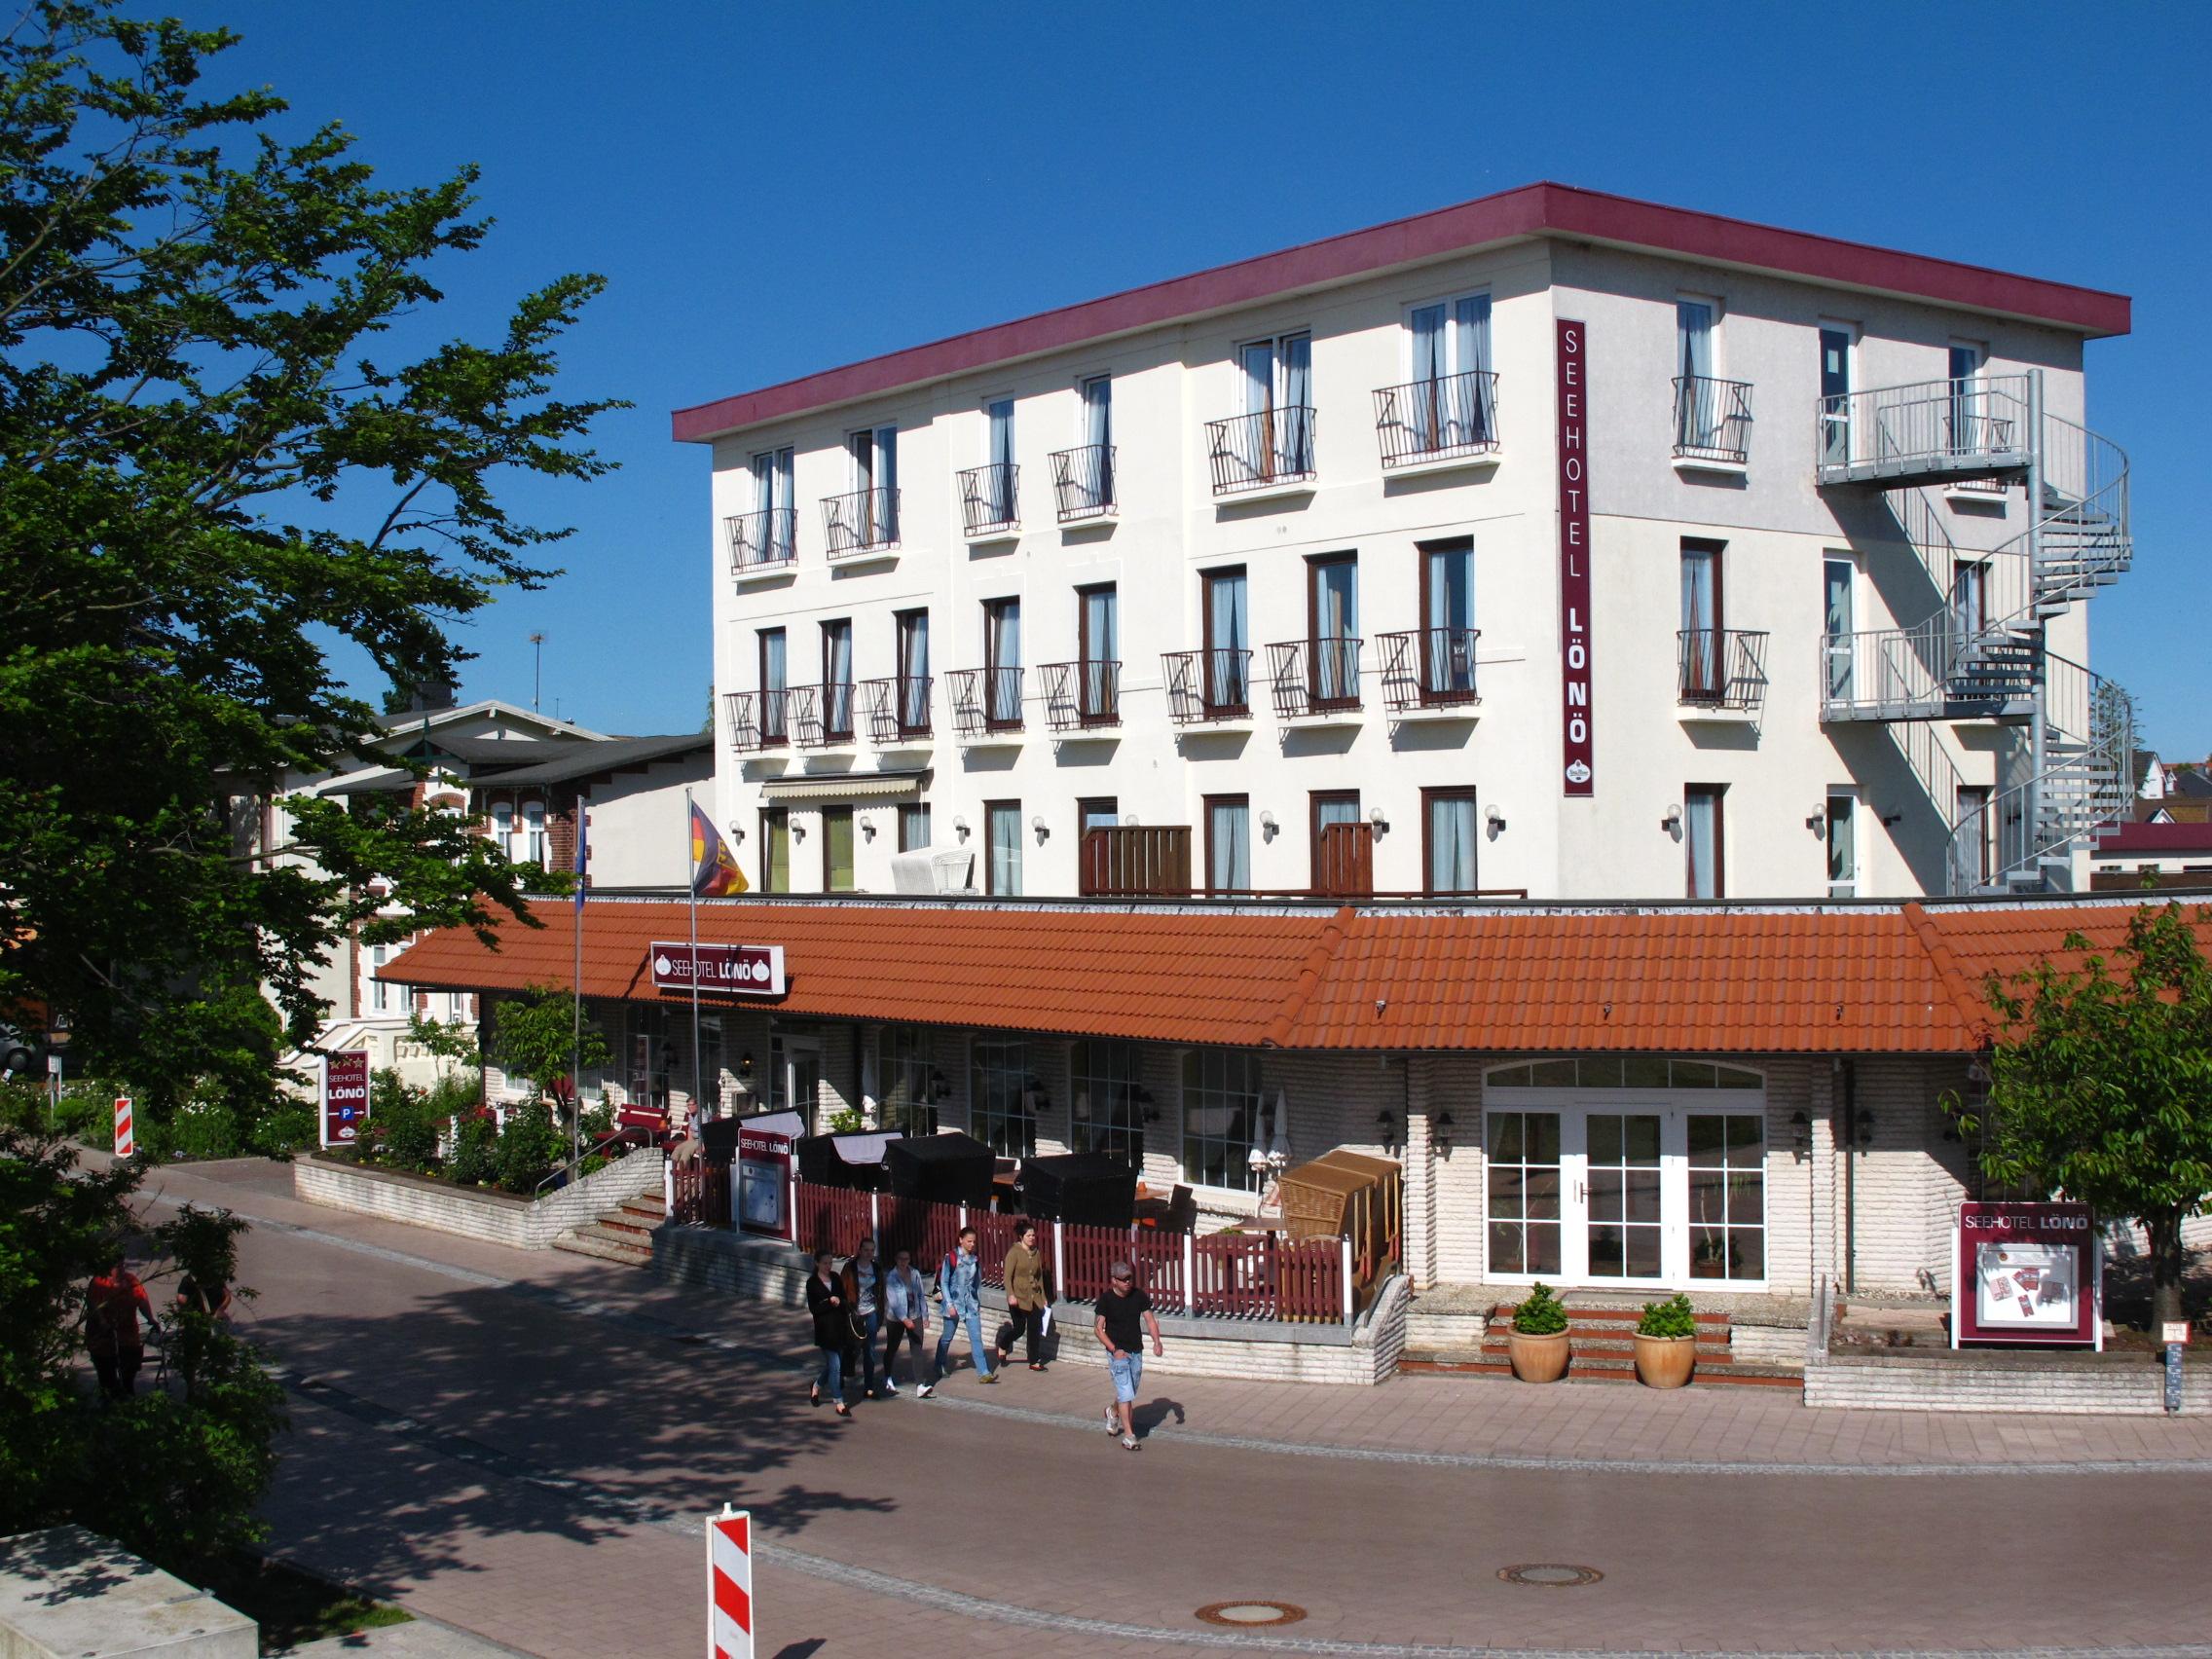 Seehotel Lönö